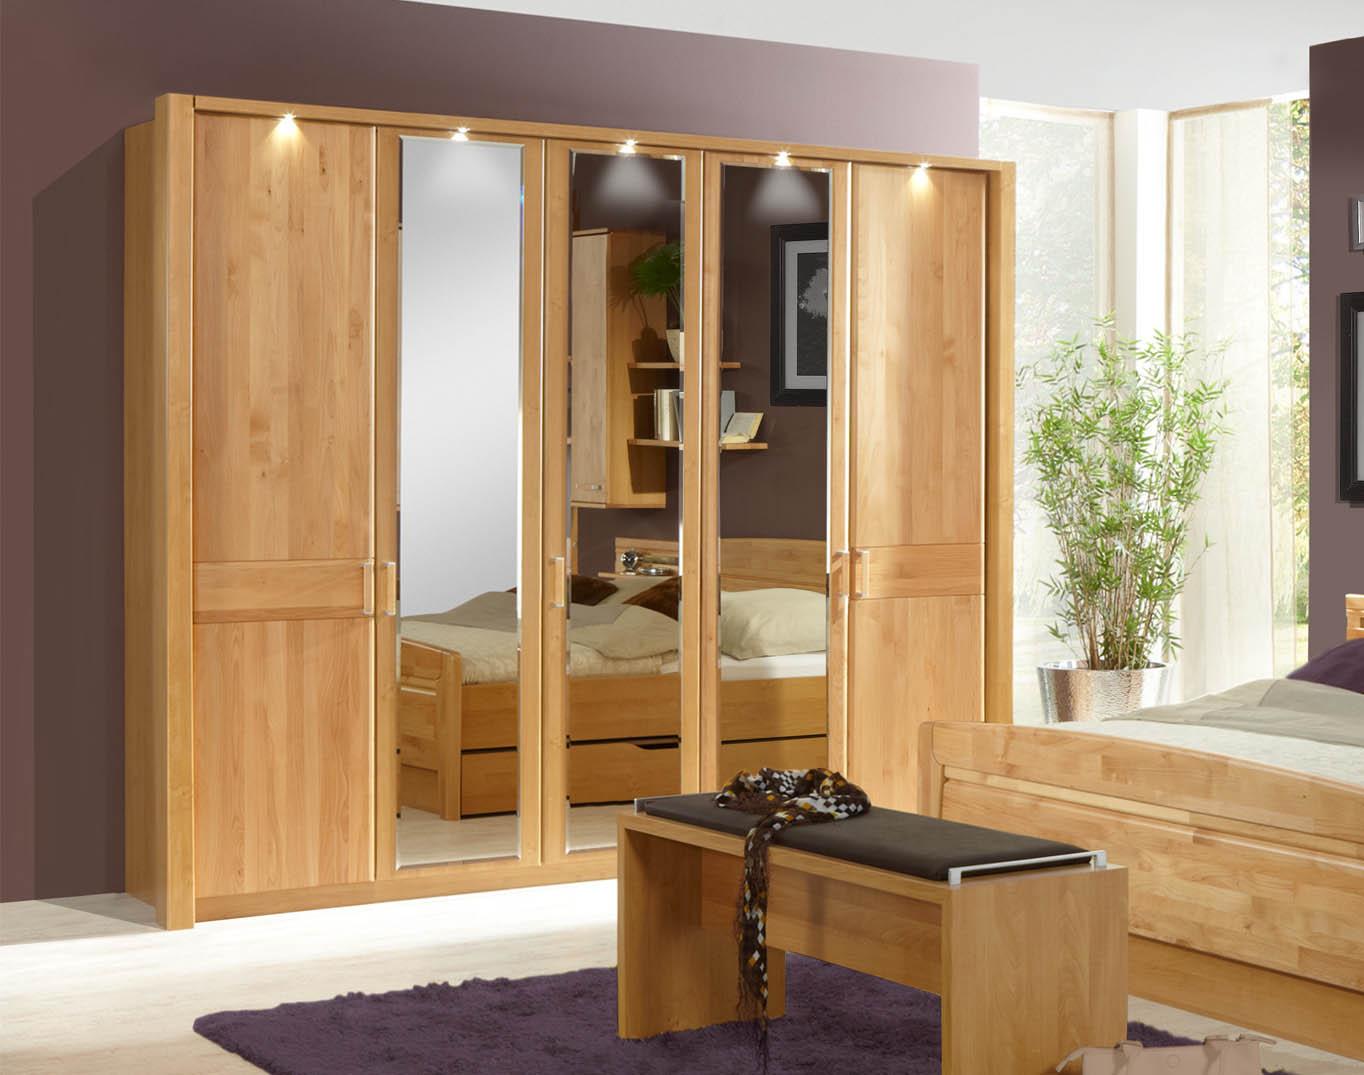 kleiderschrank lausanne erle led beleuchtung wiemann massiva m. Black Bedroom Furniture Sets. Home Design Ideas